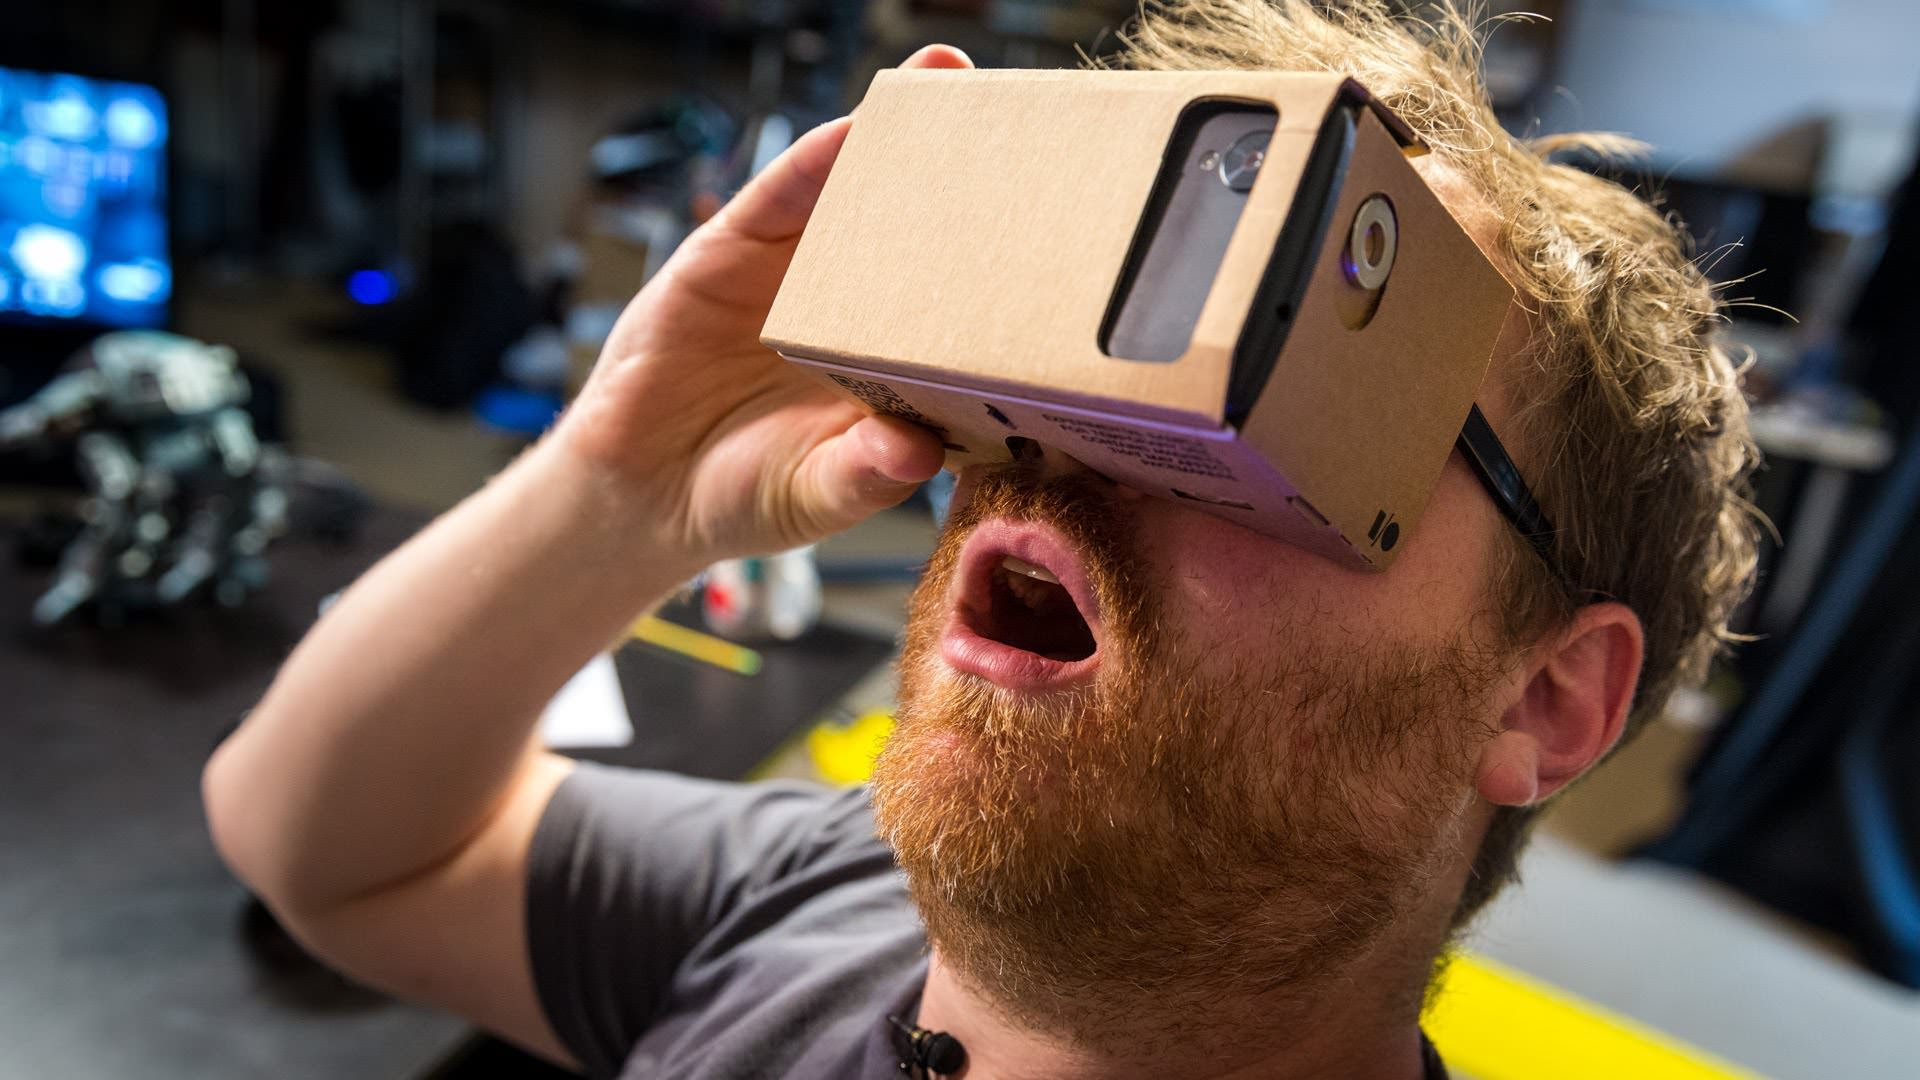 How to make Google's DIY Cardboard VR Headset at Home